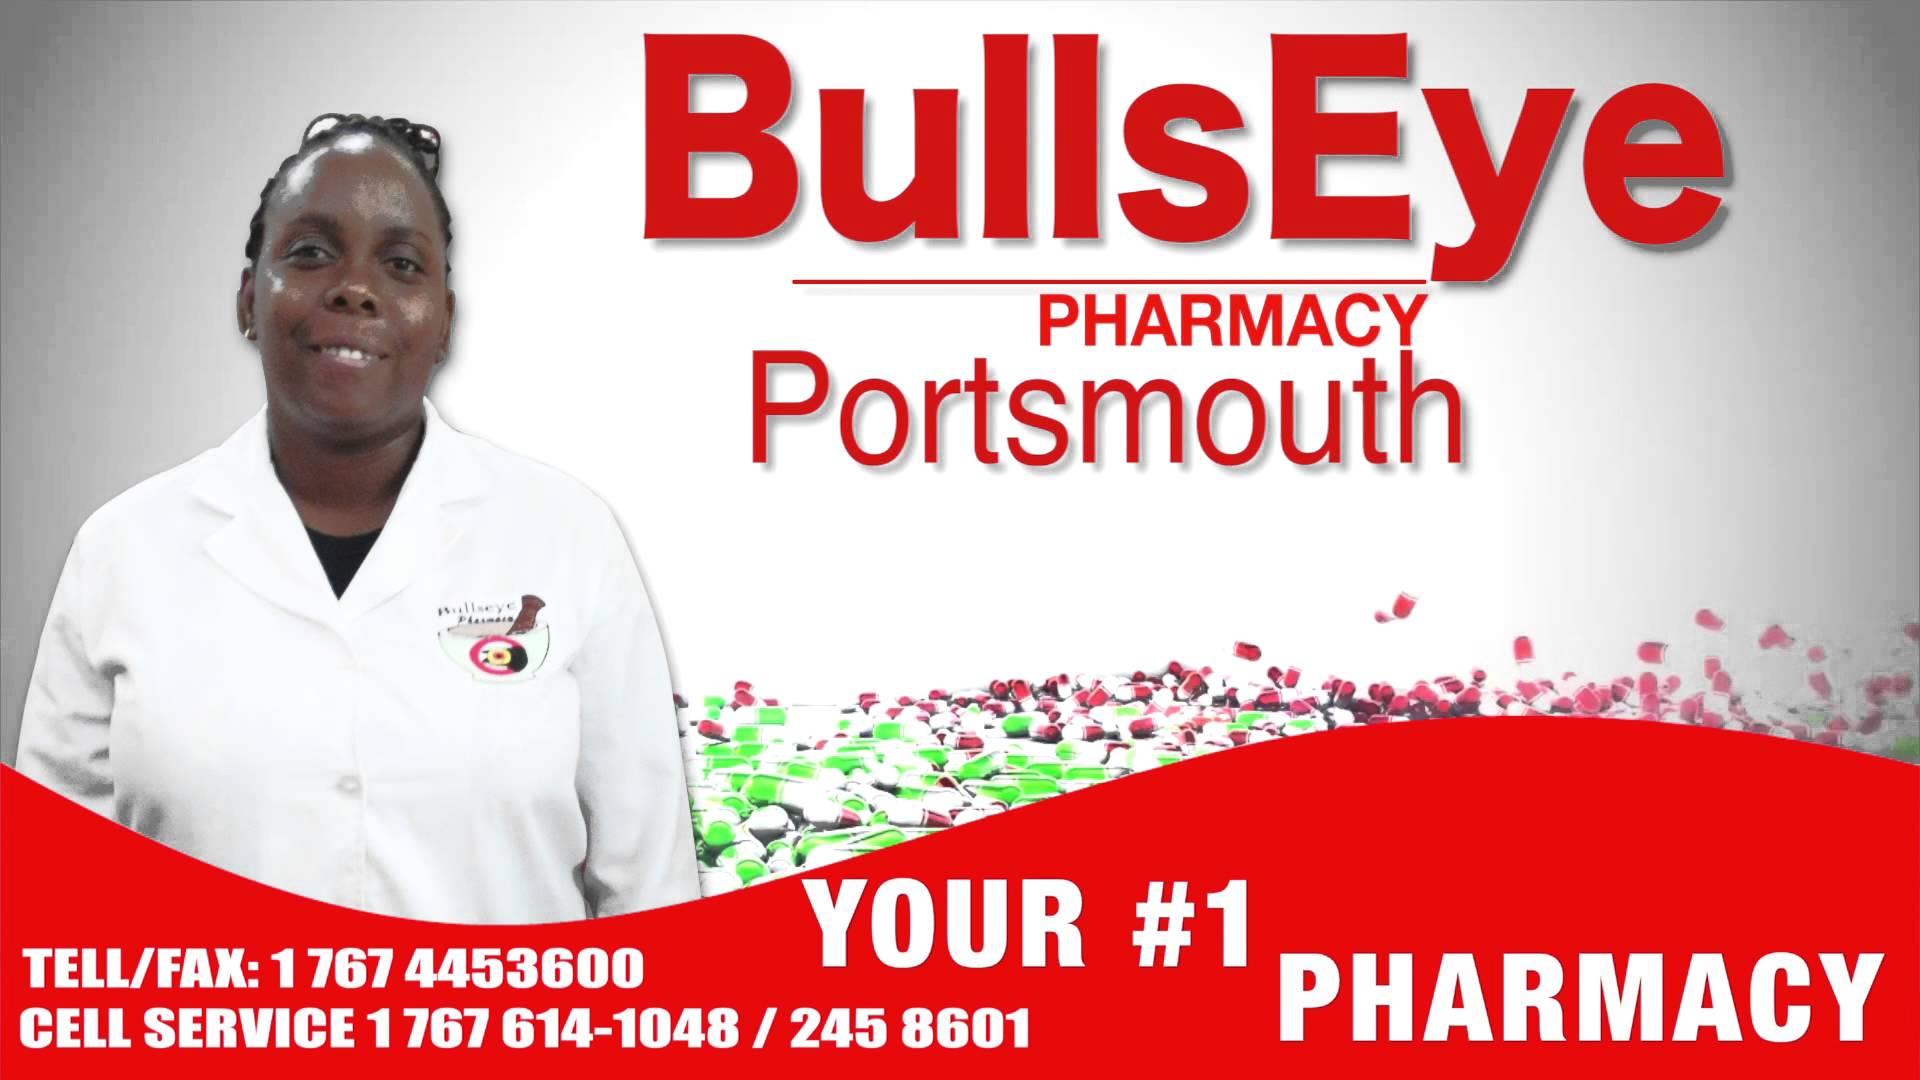 Bullseye Pharmacy